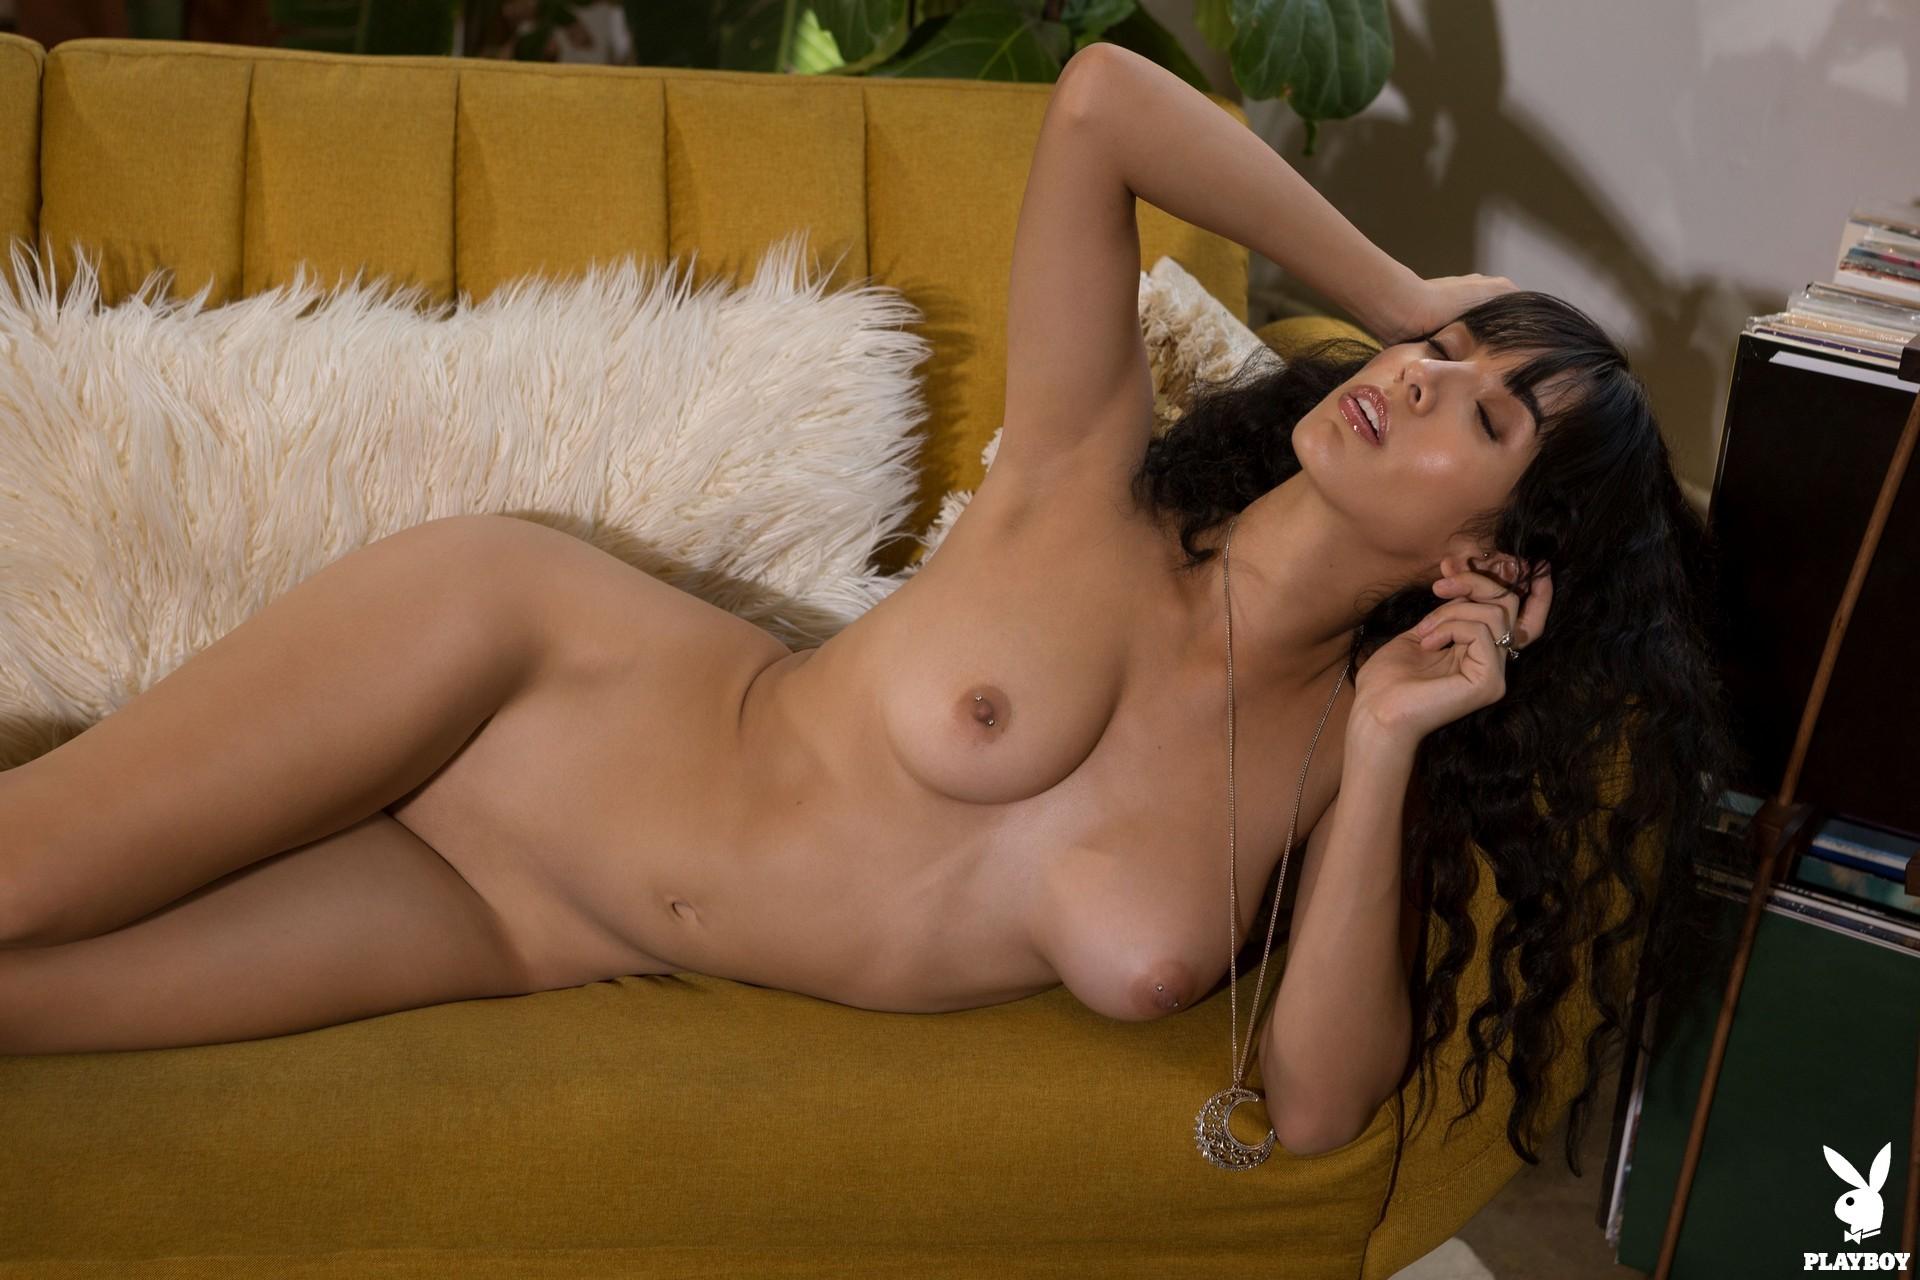 Erika De Leija in Funky and Free - Playboy Plus 14